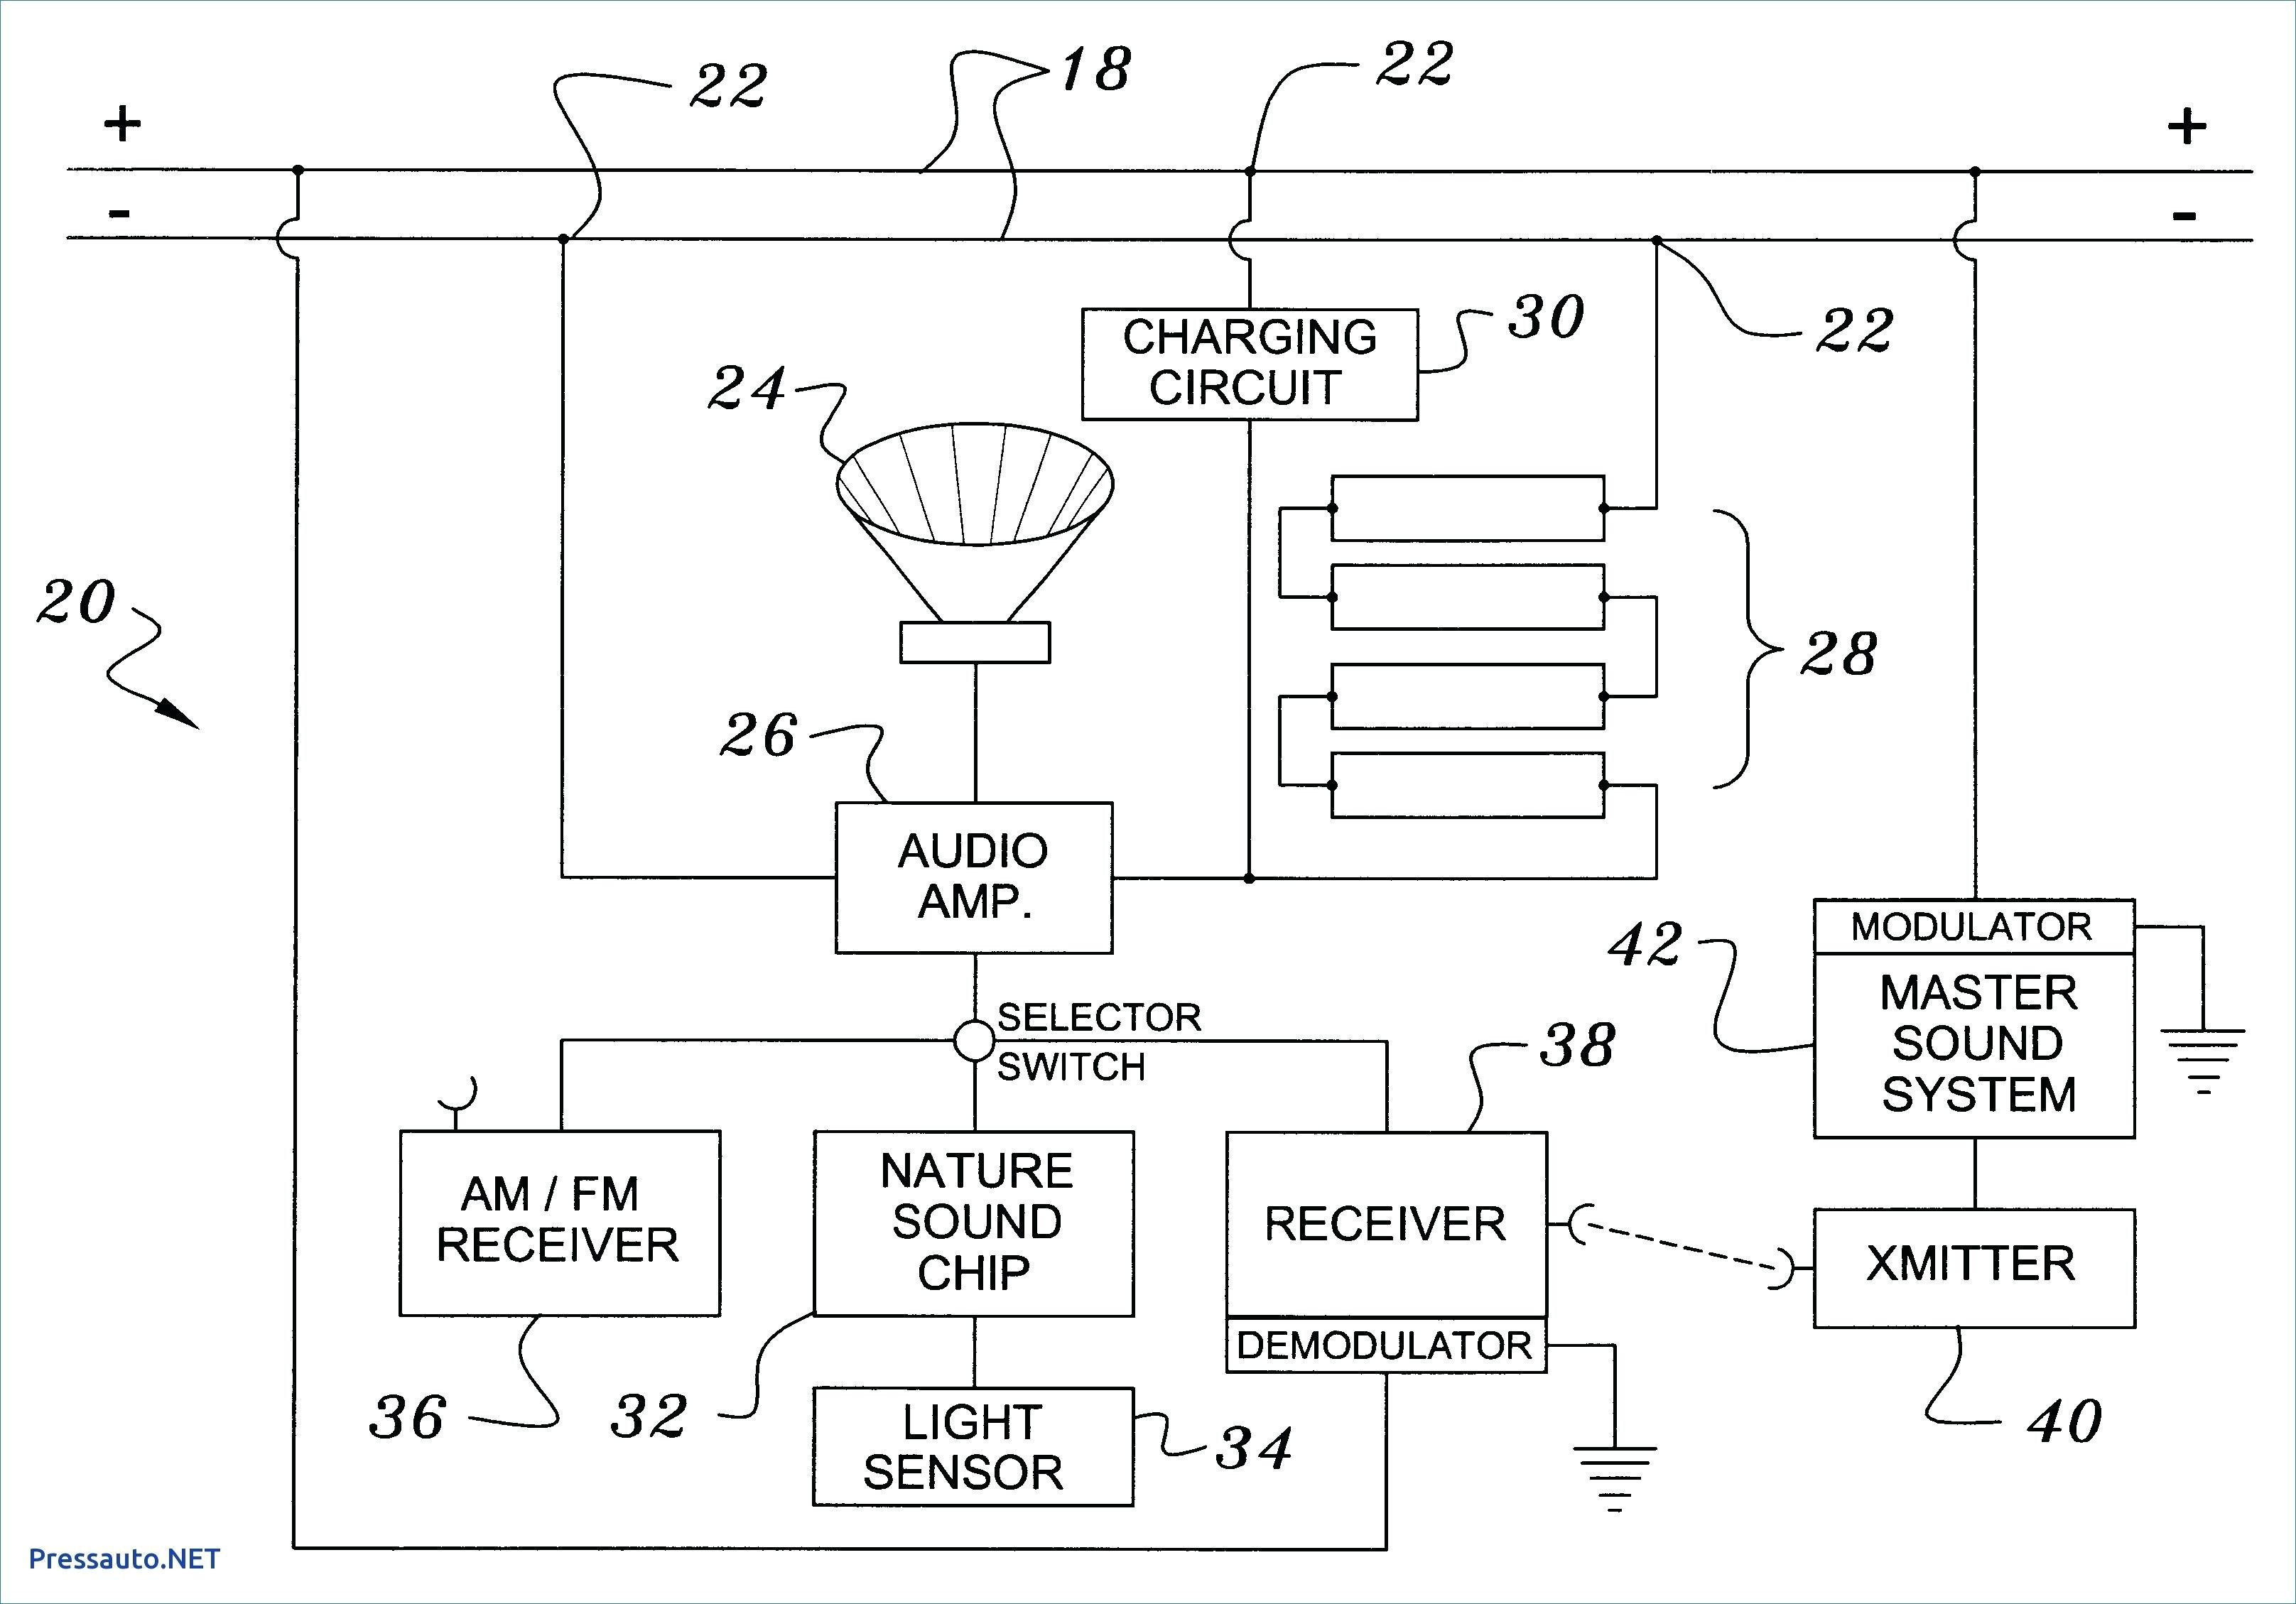 480 Volt Lighting Circuit Diagram | Wiring Diagram - 277 Volt Lighting Wiring Diagram